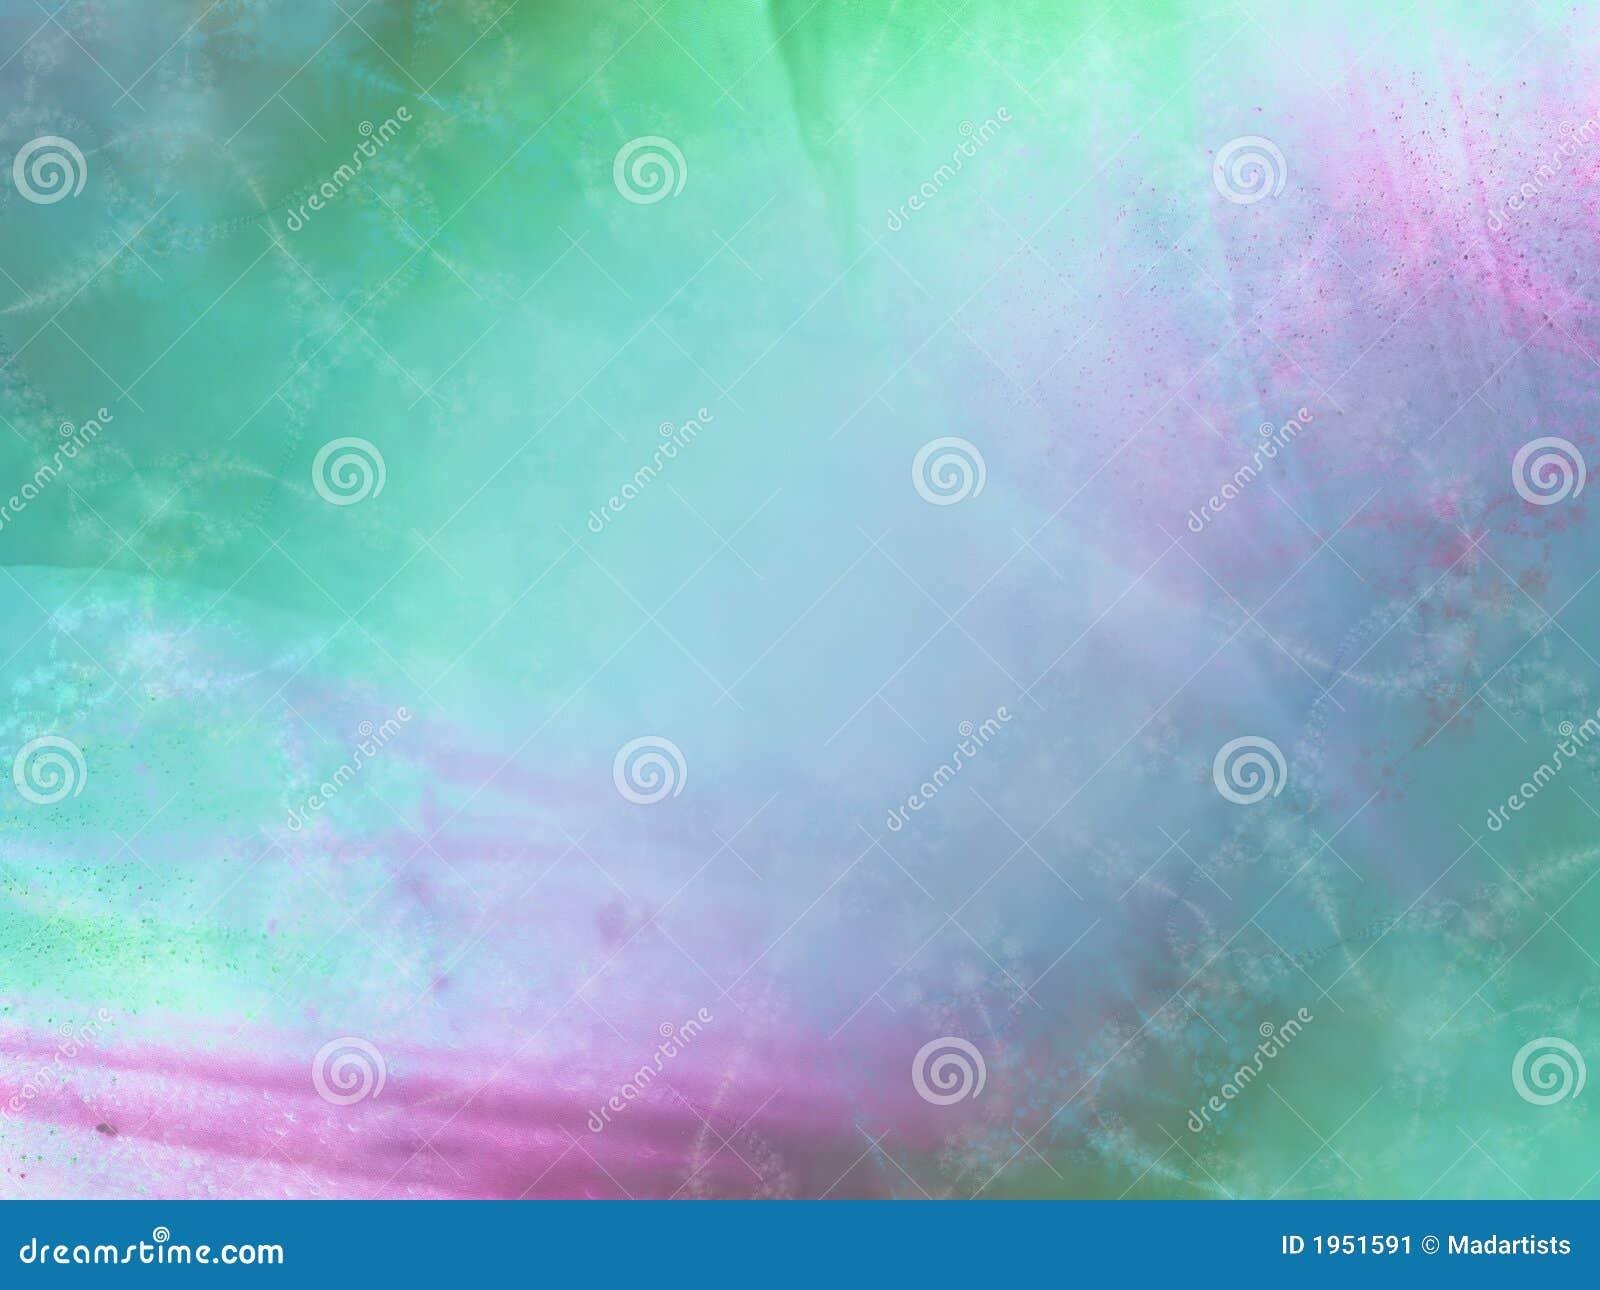 Soft Aqua Blue Purple Texture